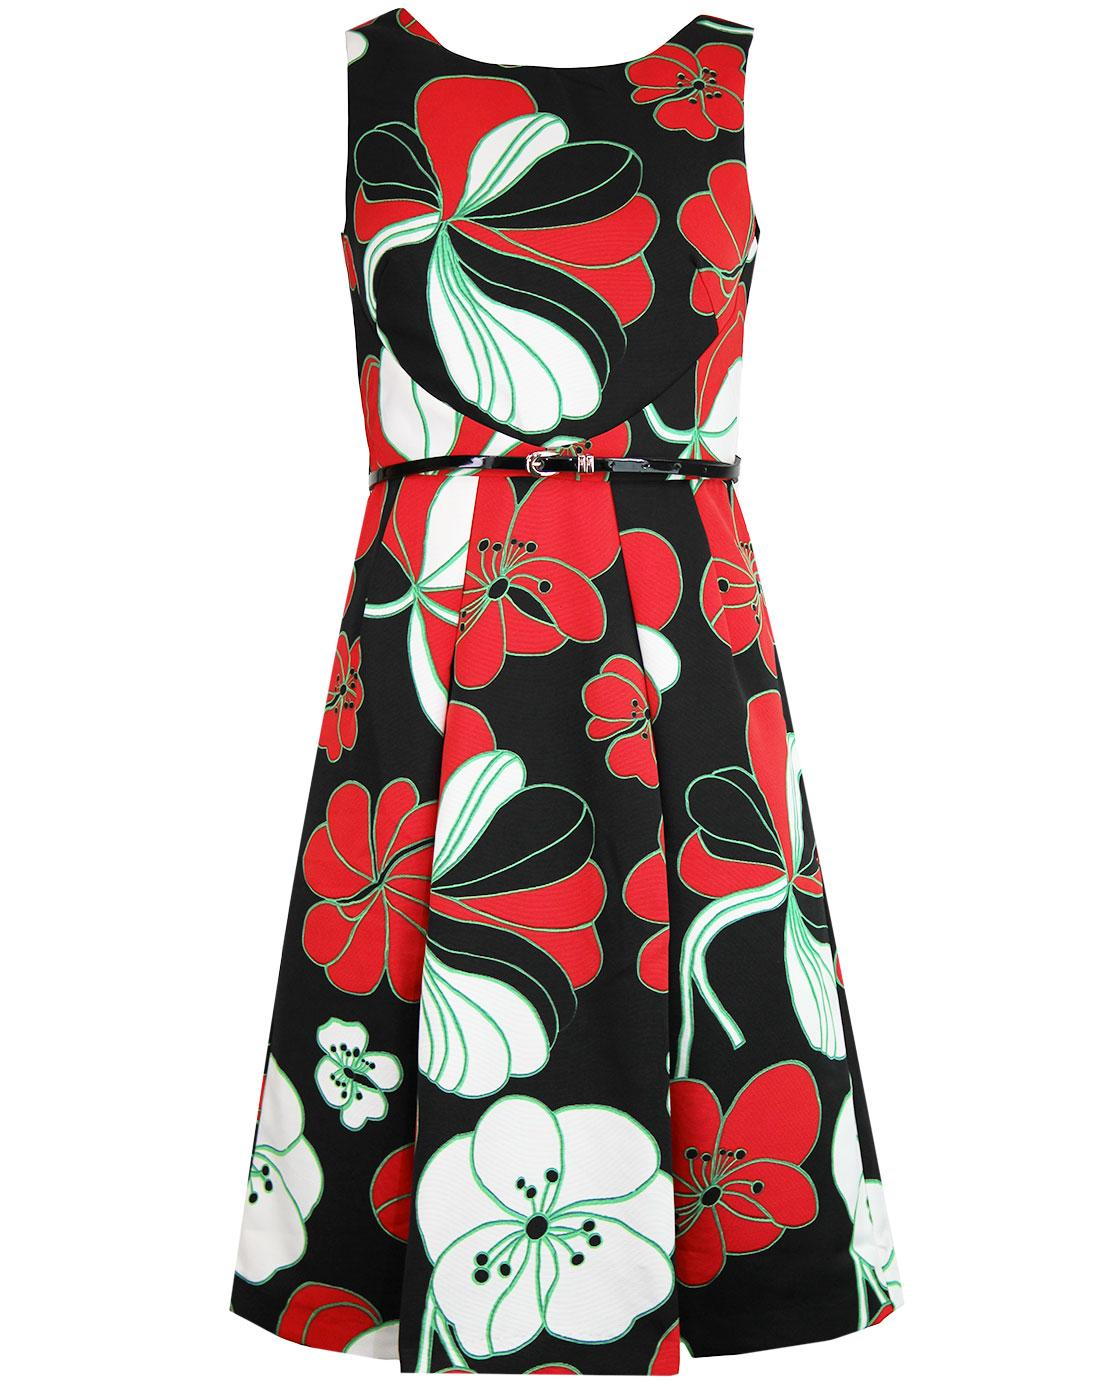 Doris TRAFFIC PEOPLE Retro 60s Floral Summer Dress